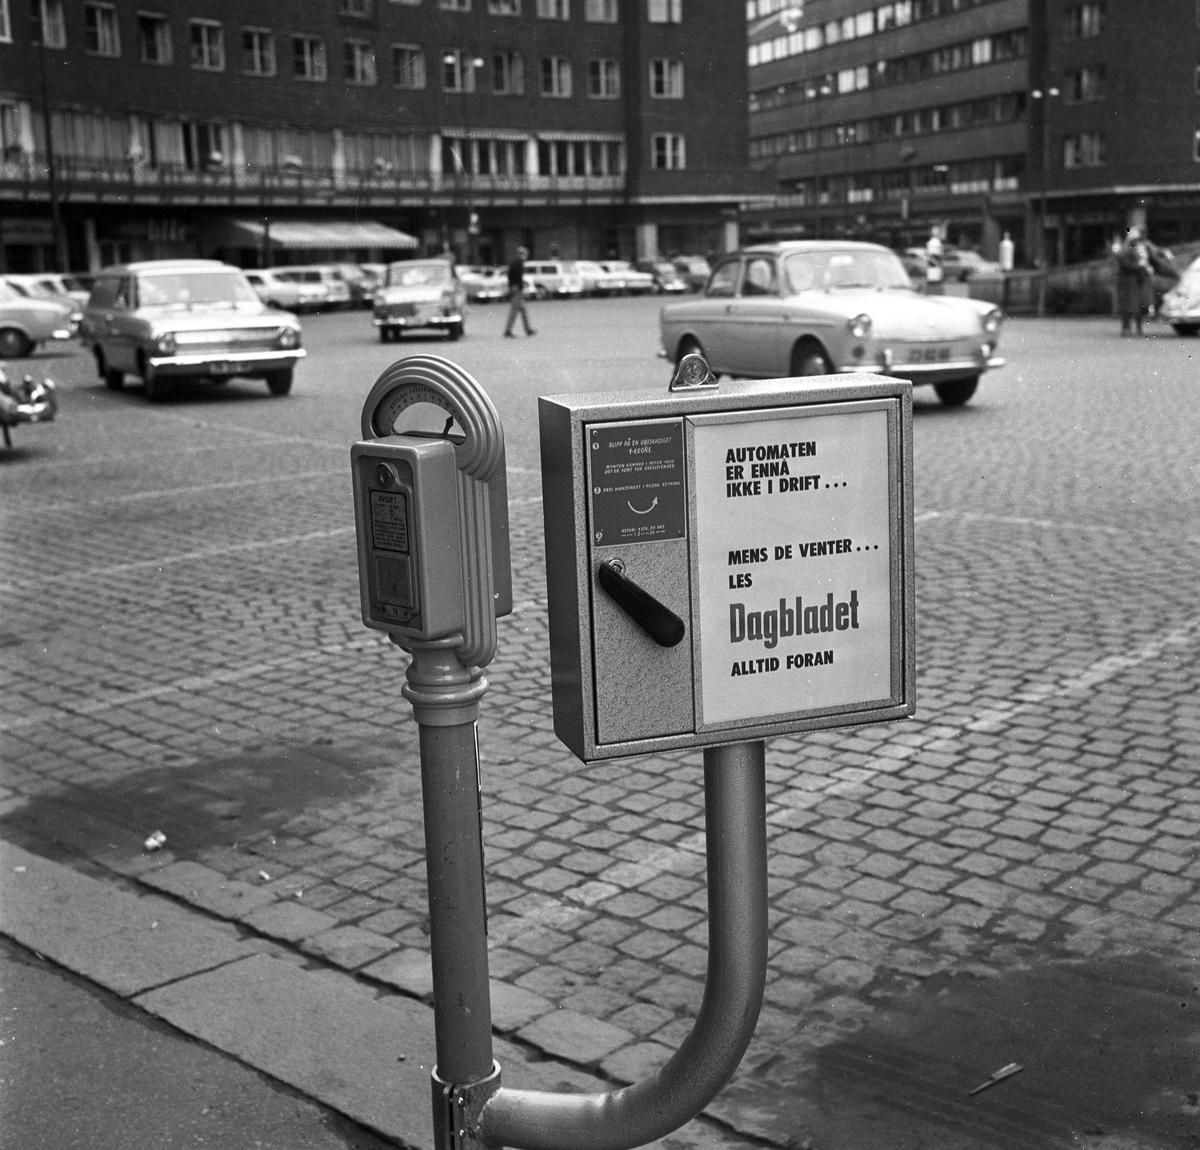 Reklameskilt Dagbladet. Fotografert 1965.